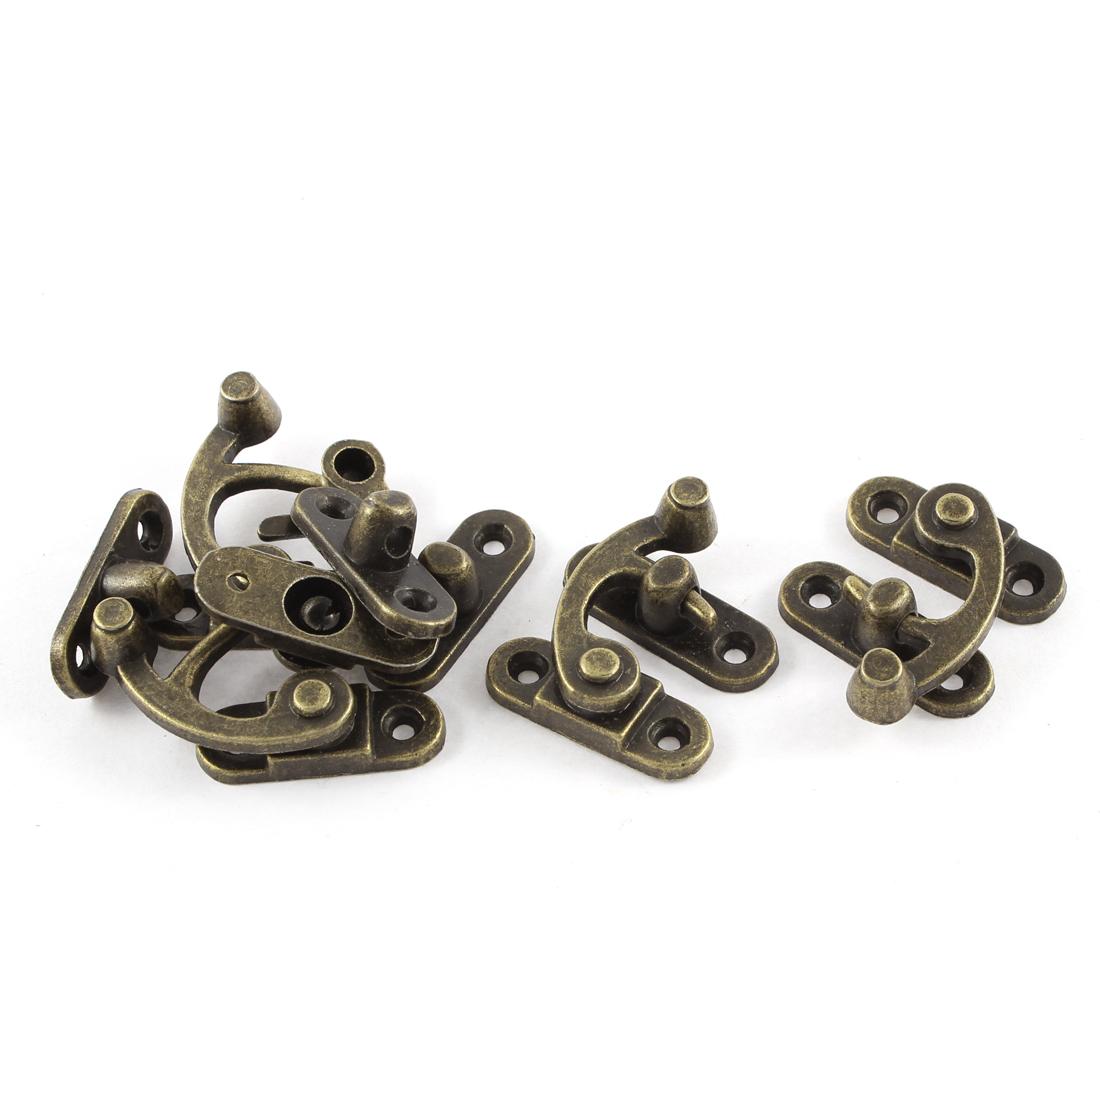 5pcs 33mmx29mm Retro Style Jewelry Cigar Box Decorative Hook Lock Latch